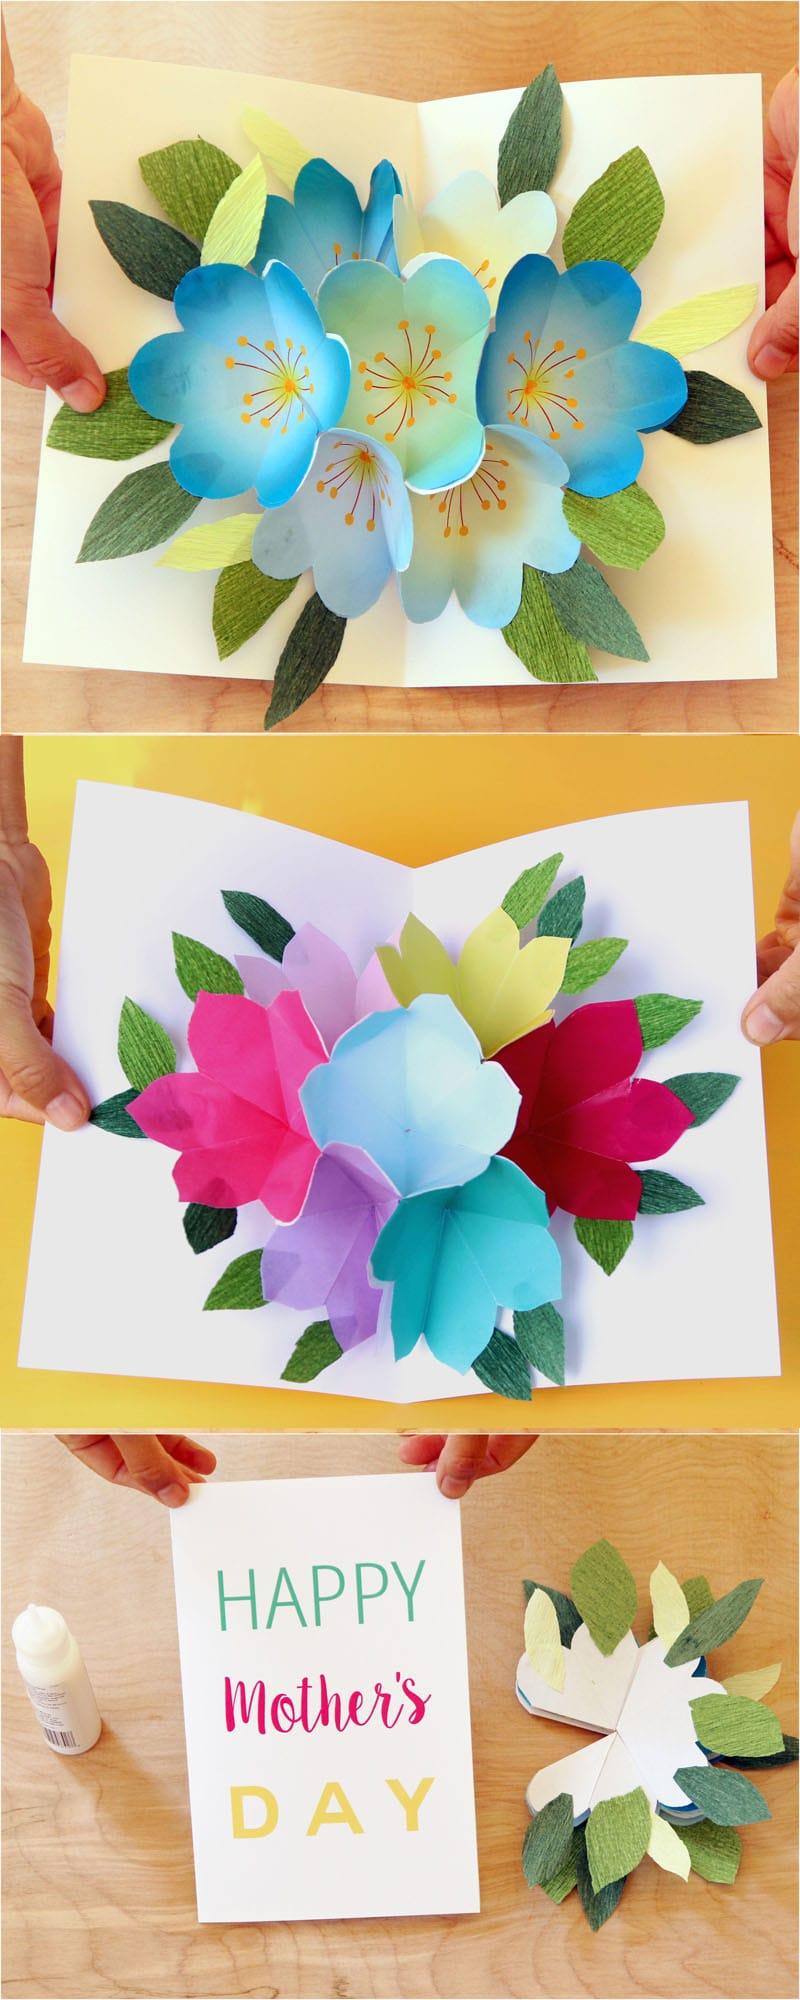 pop up flowers diy printable mother's day card  diy pop